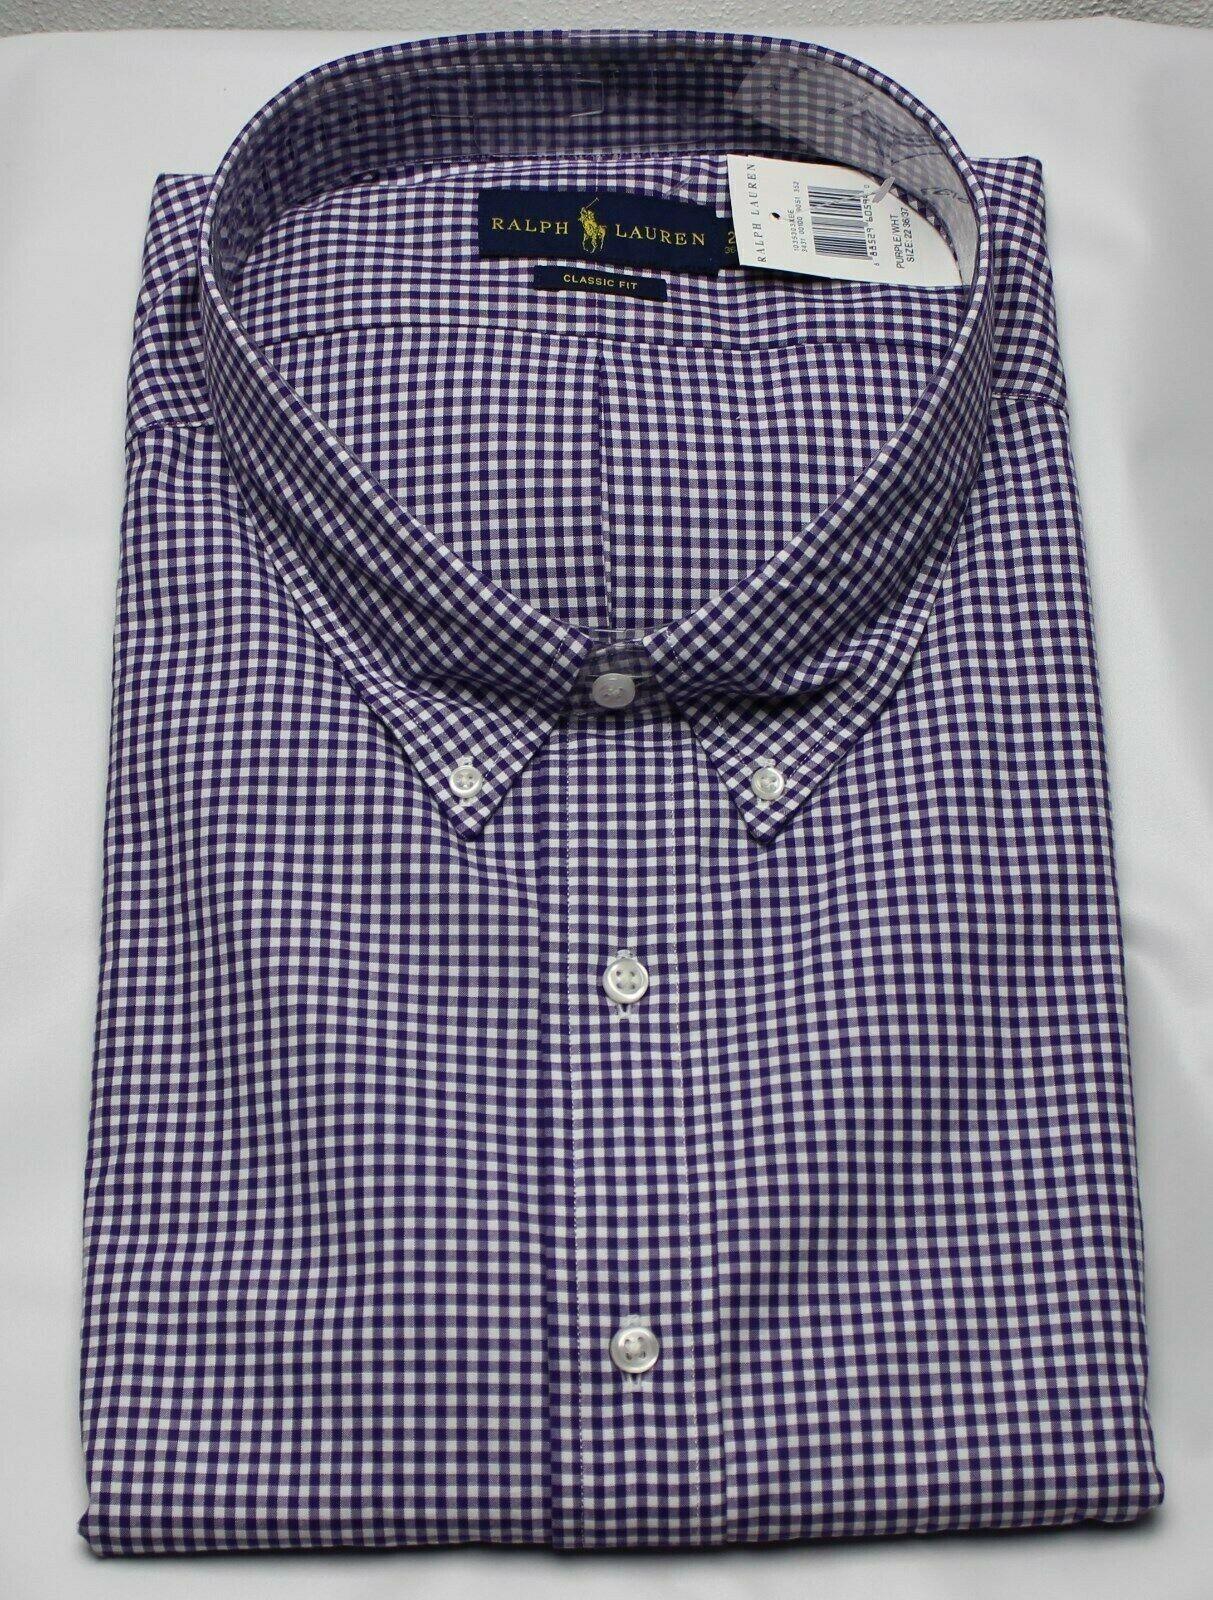 Polo Ralph Lauren Dress Shirt Mens 21 36 37 Classic Fit Purple White Green Pony